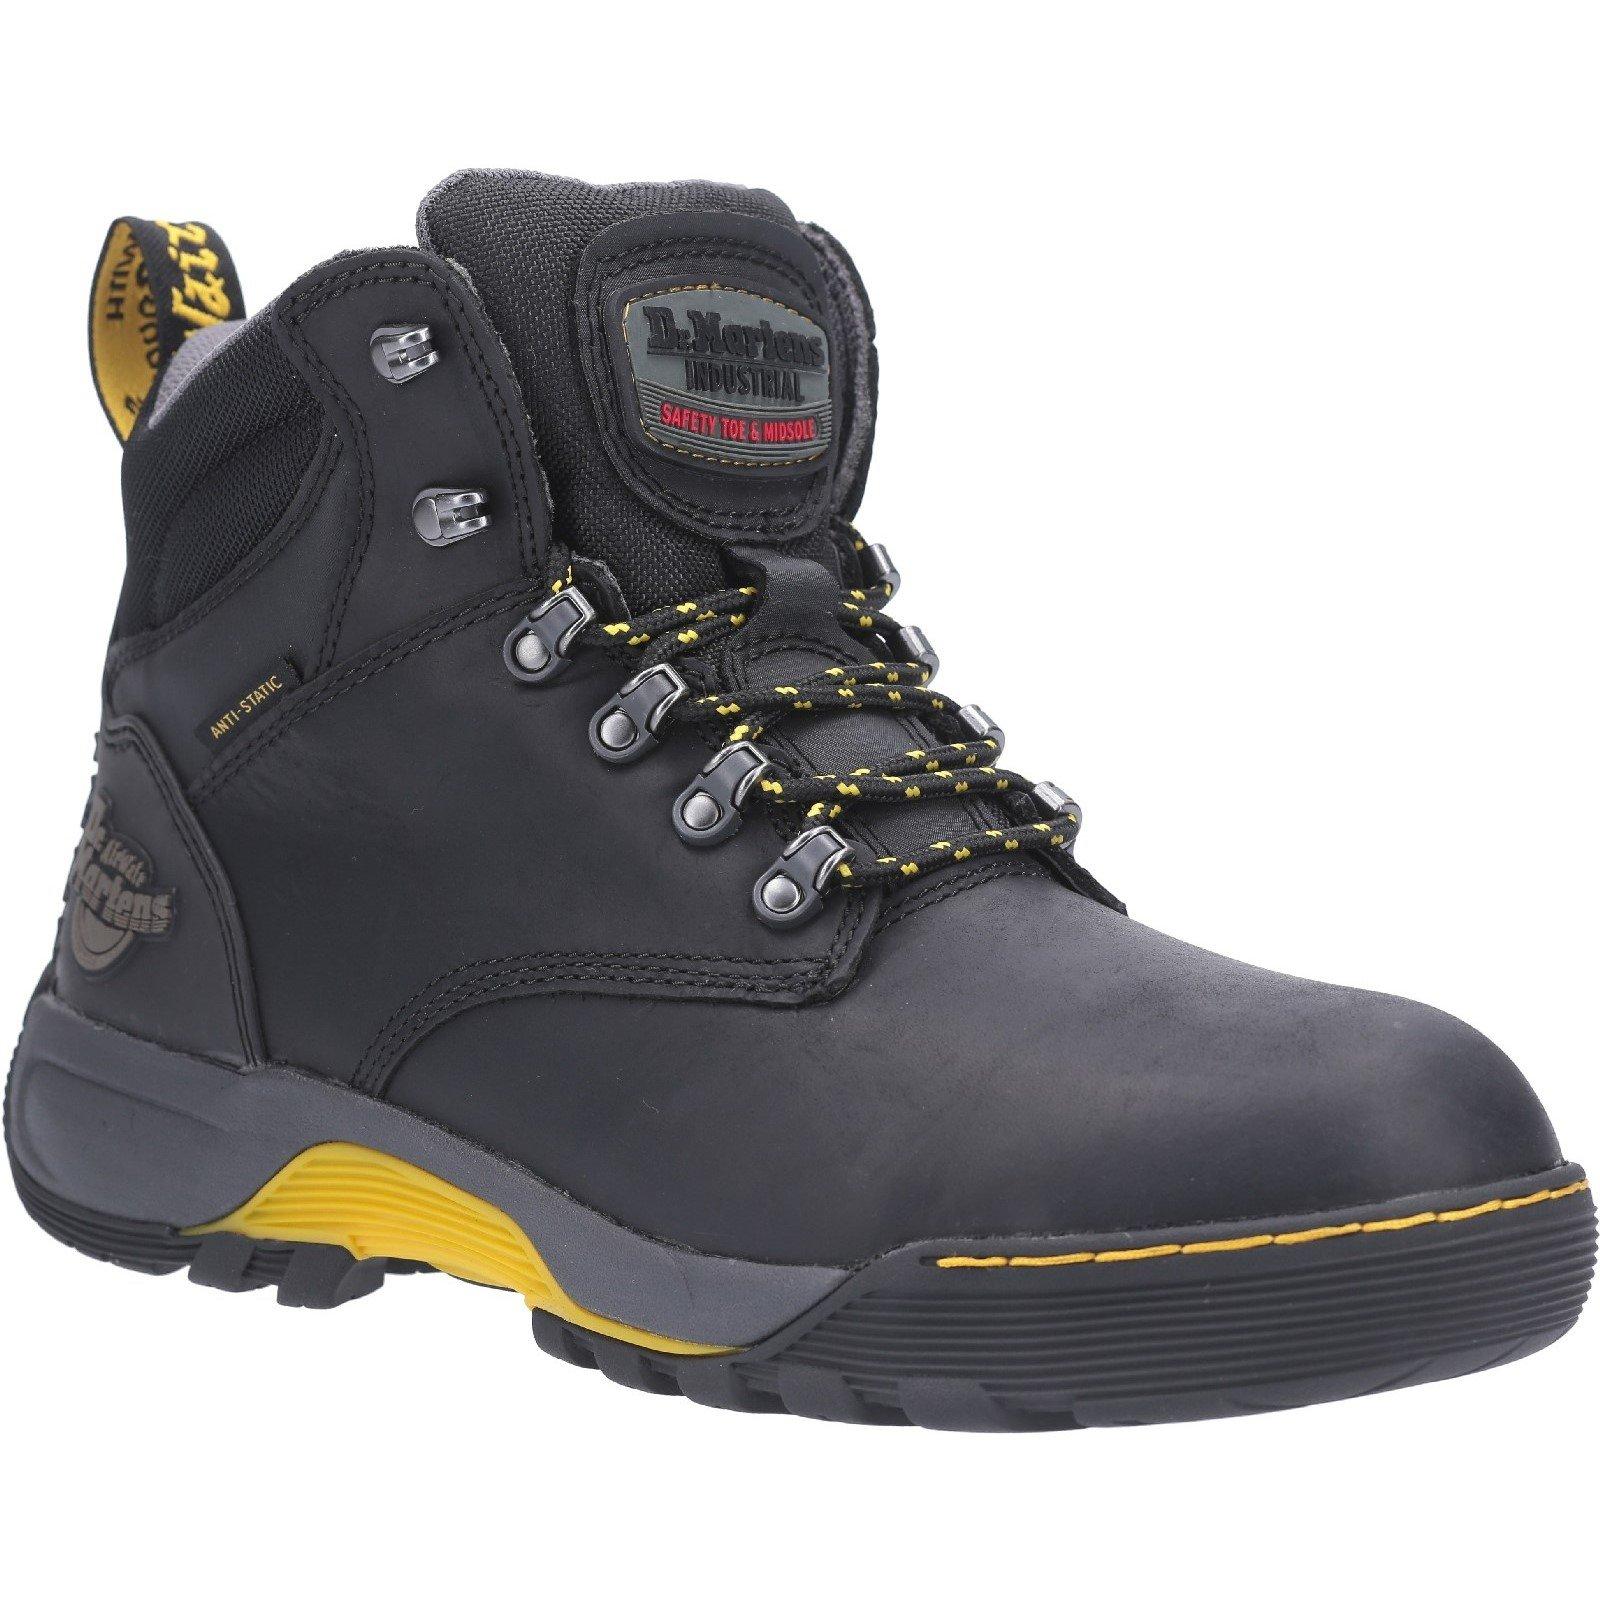 Dr Martens Unisex Ridge ST Lace Up Hiker Safety Boot Black 28324 - Black 6